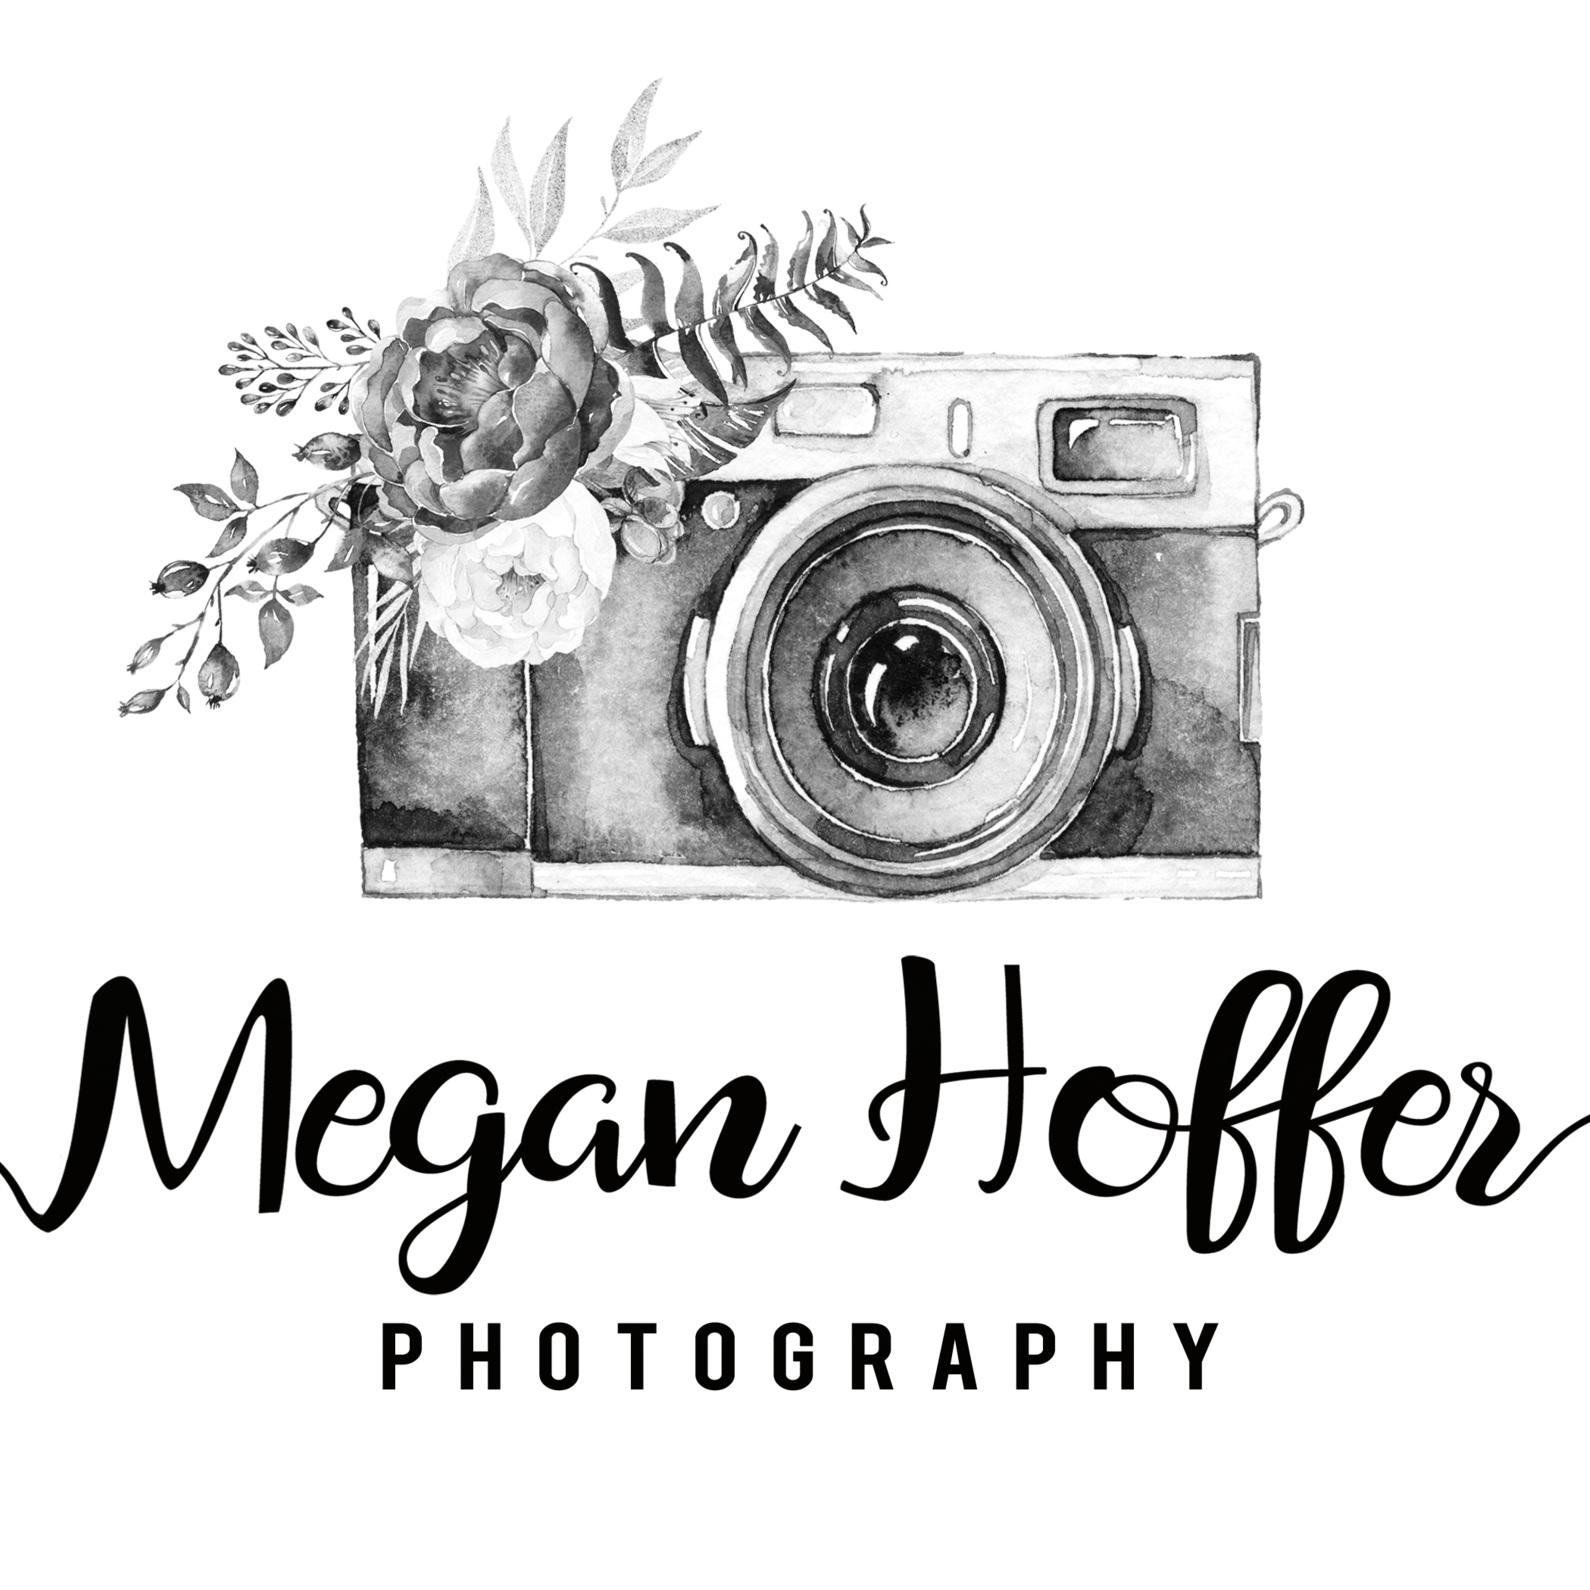 Megan+Hoffer+Photography+Logo.jpg